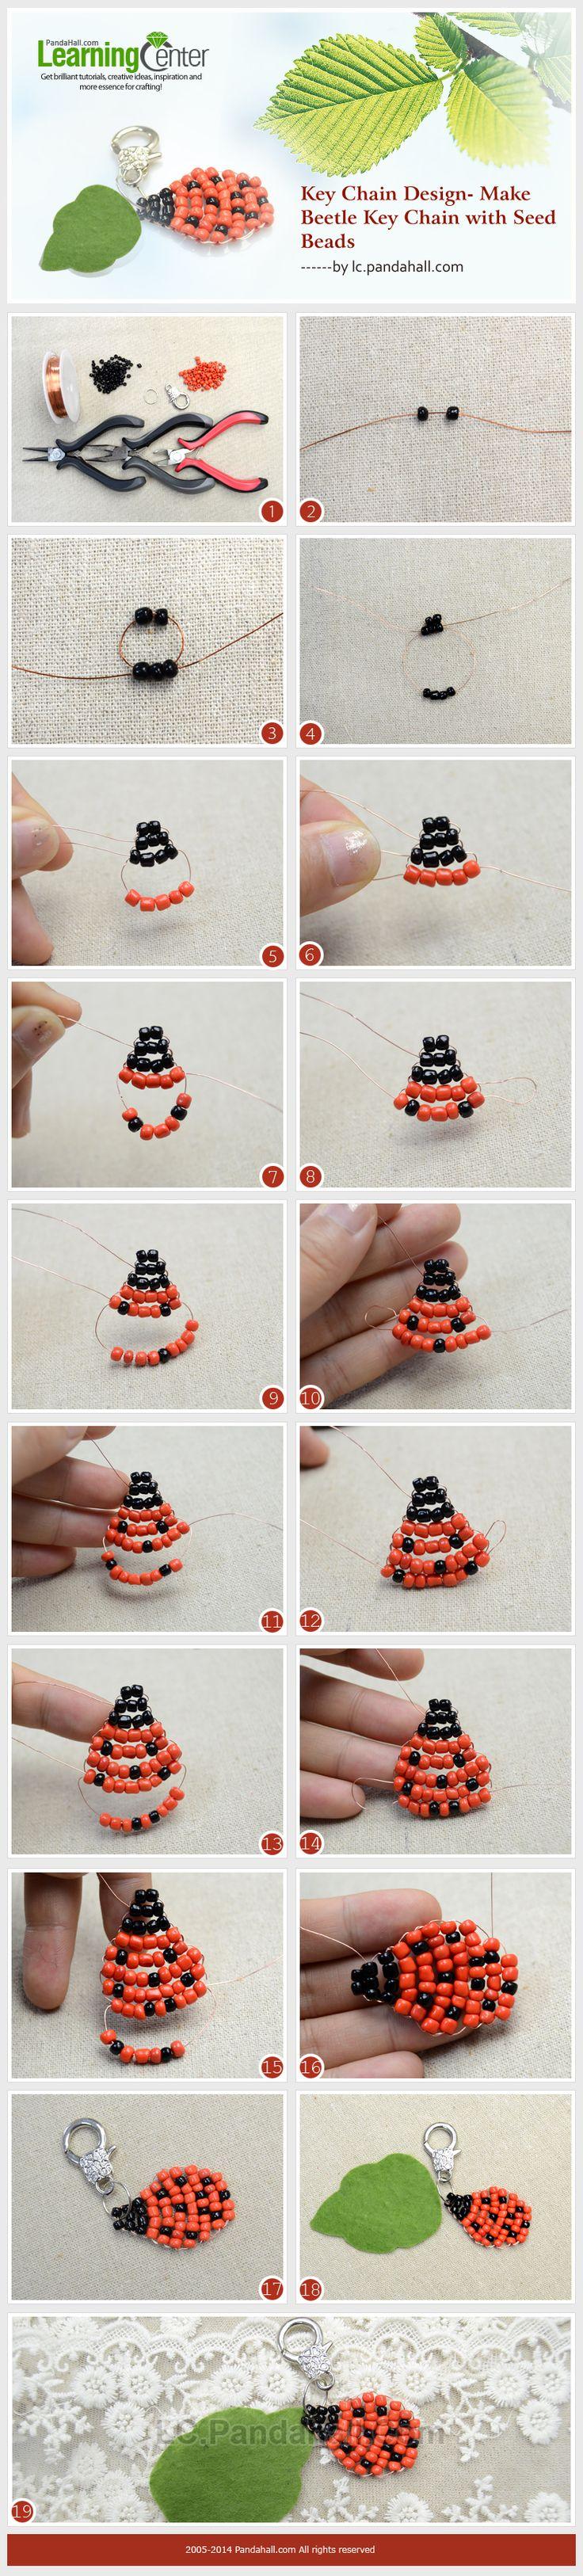 Key Chain Design- Make Beetle Key Chain with Seed Beads